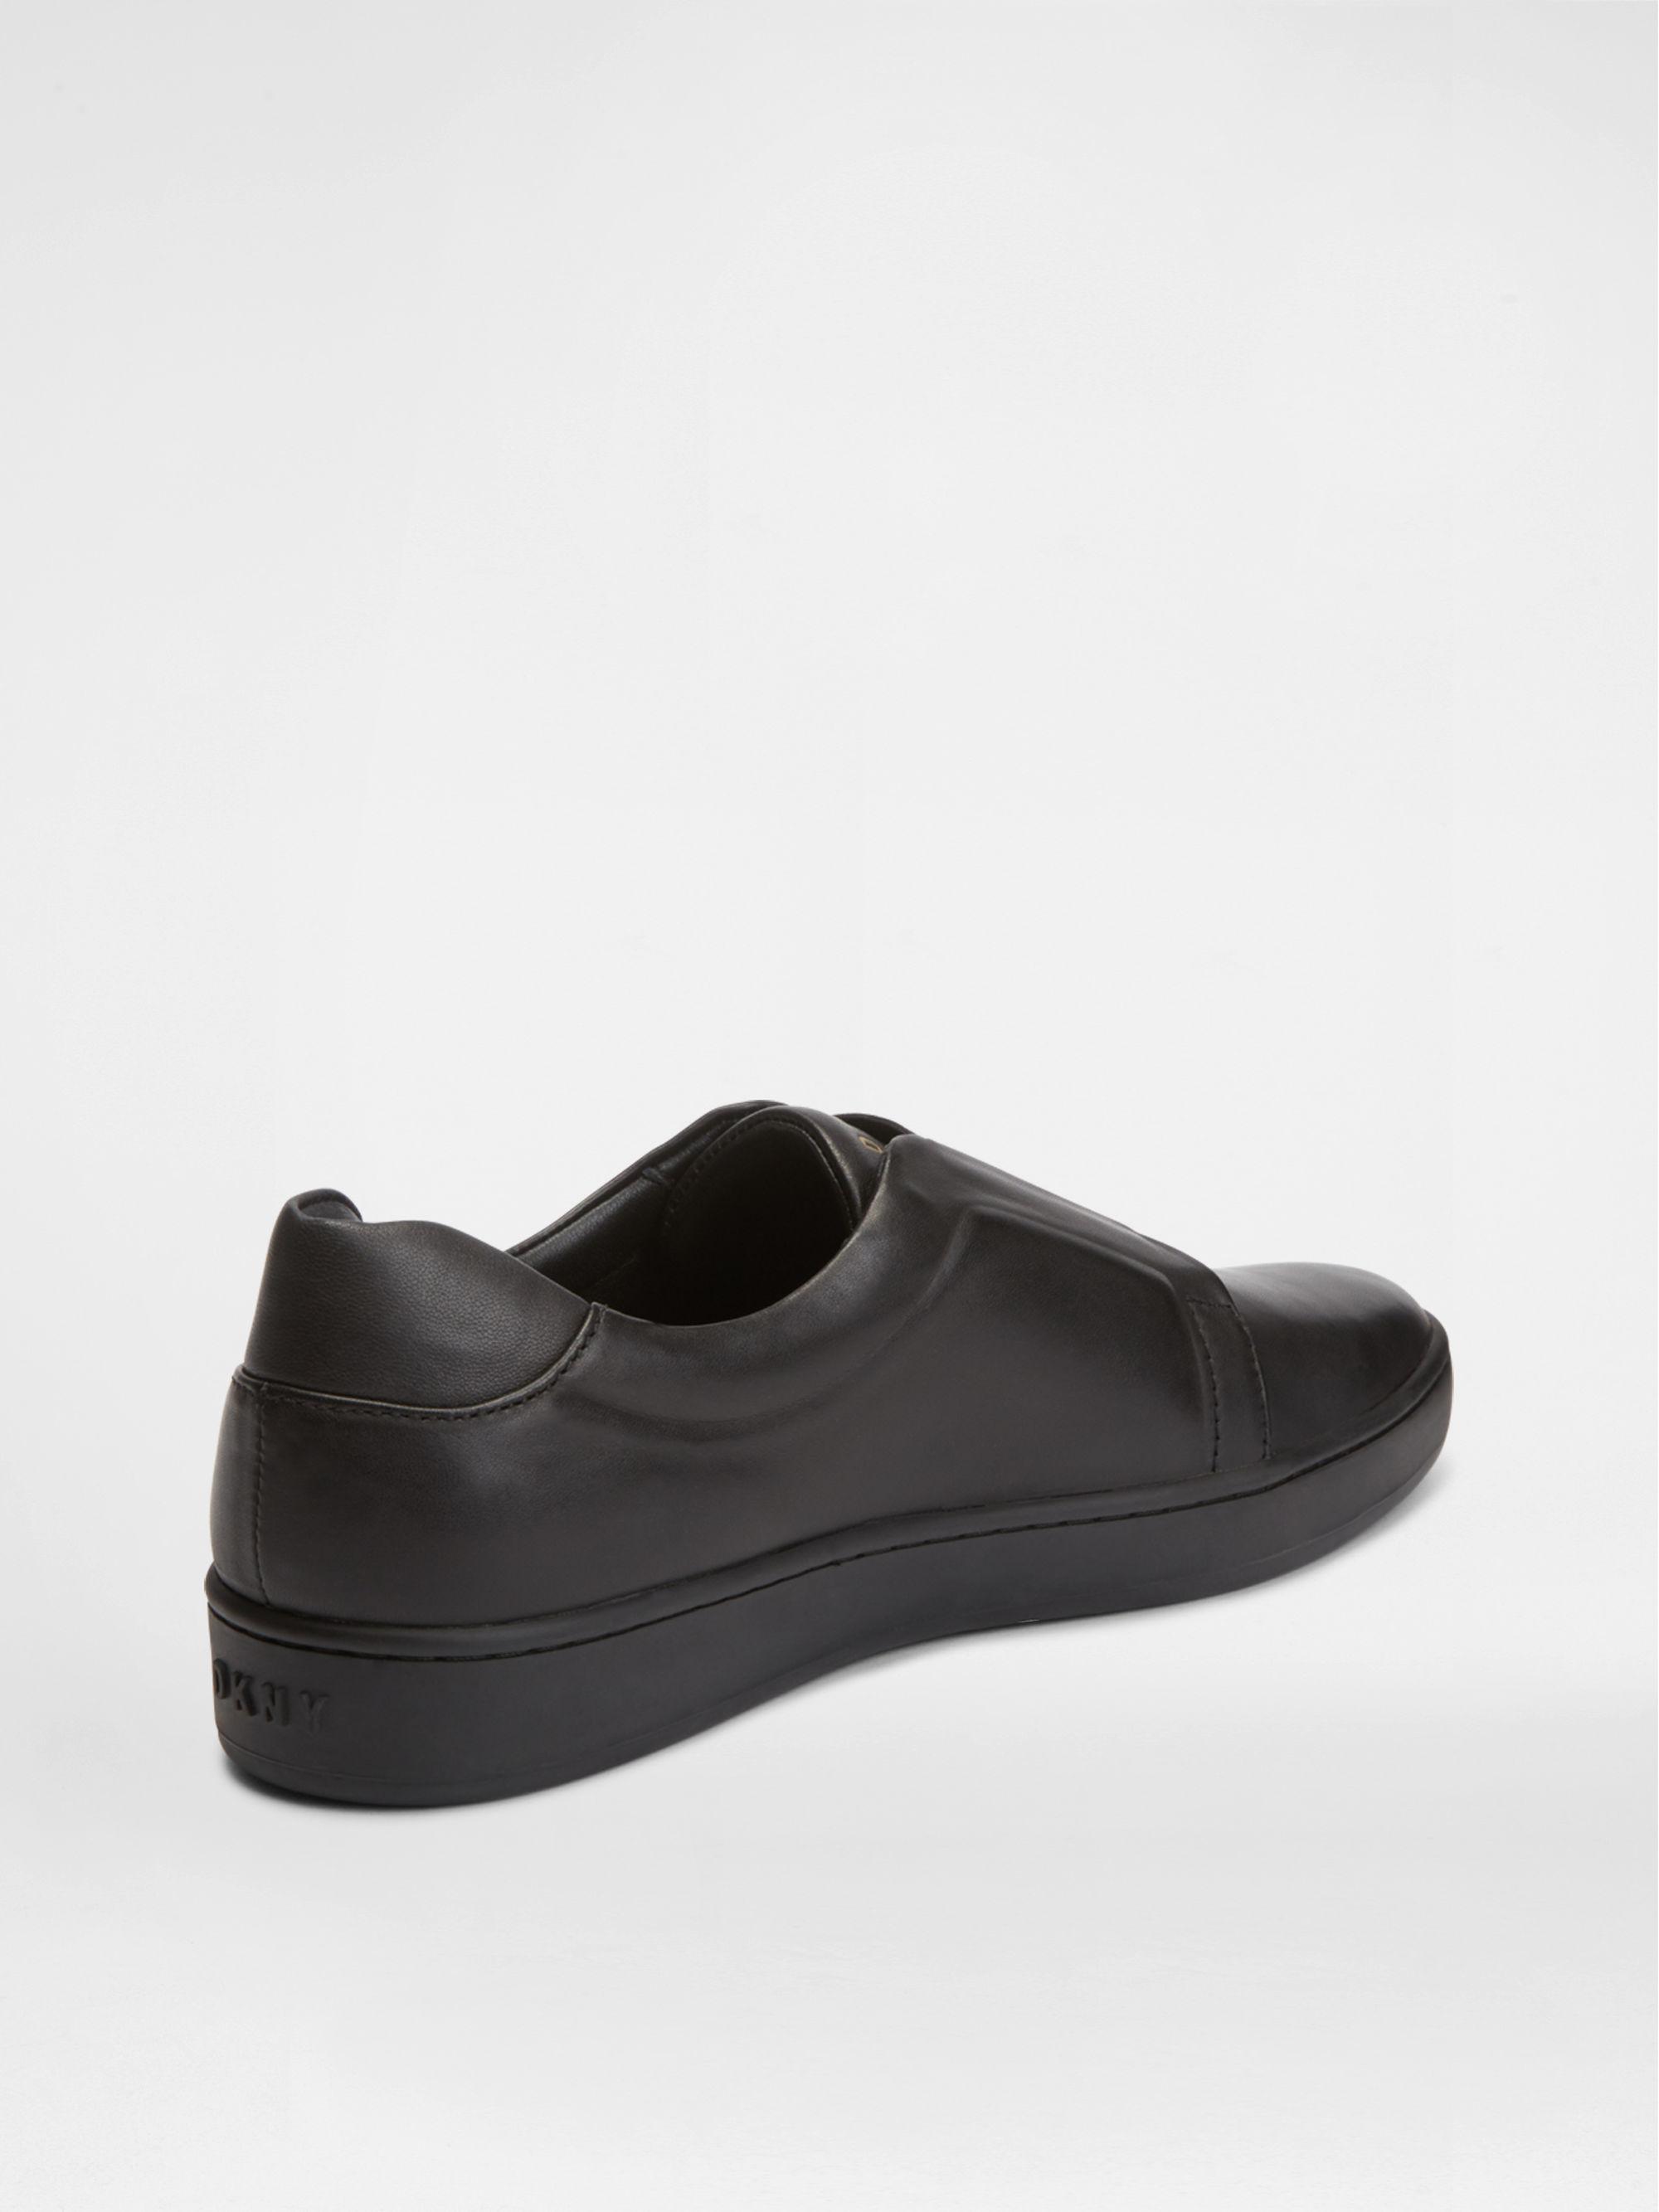 Wedges Trainer Black Shoes Hyde Heels